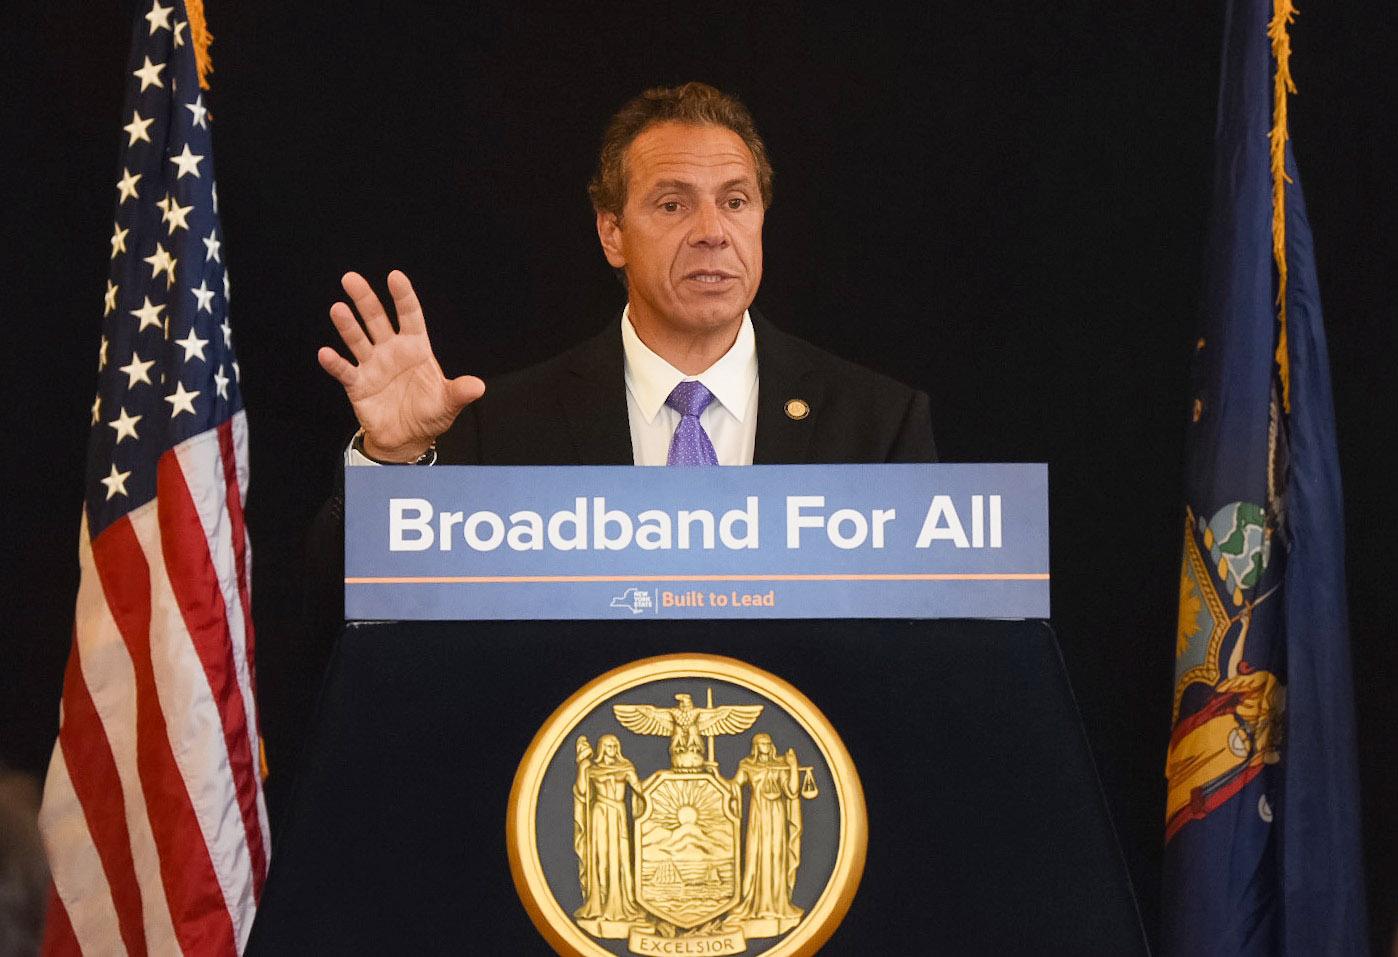 Cuomo touts progress of broadband expansion - Times Union